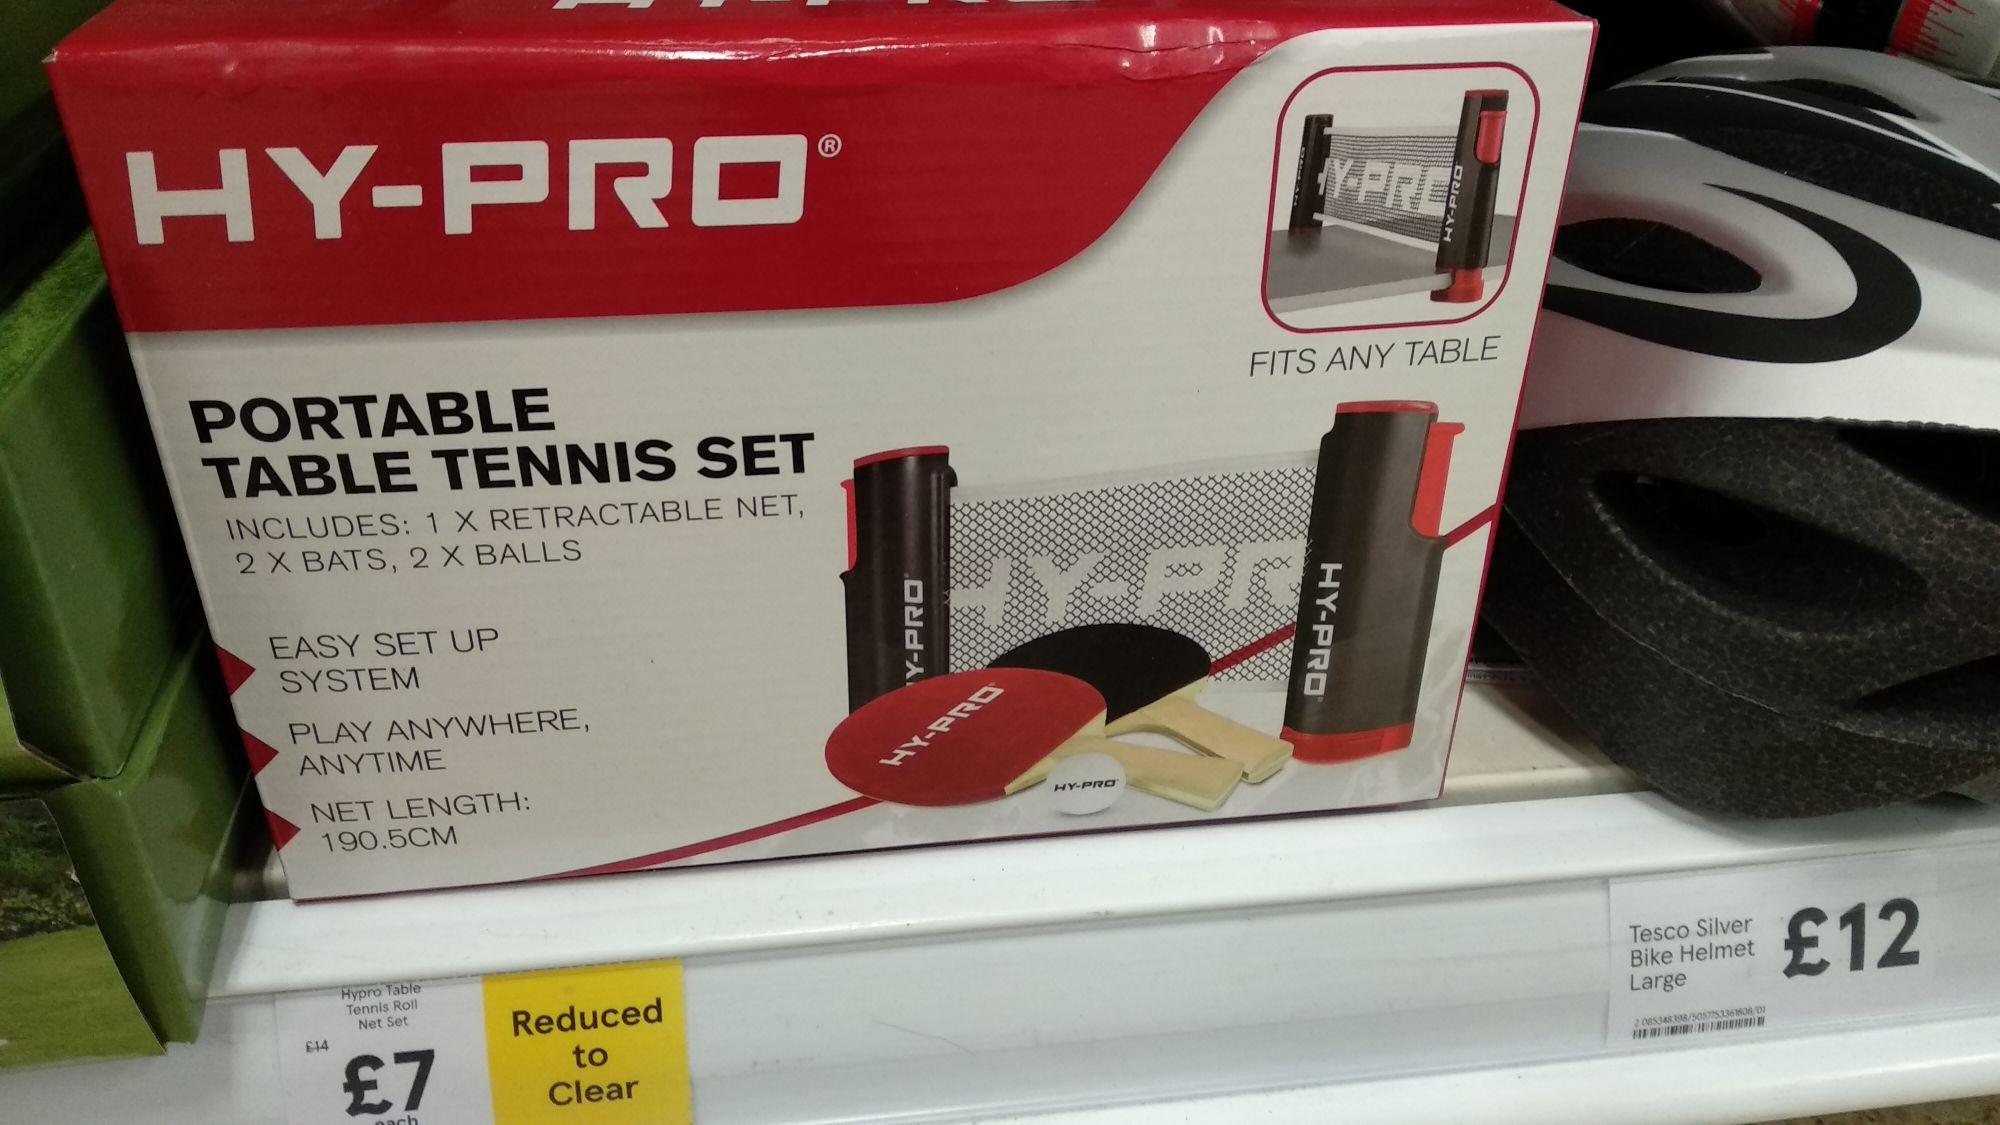 Portable Table Tennis set - £7 instore (Tesco)